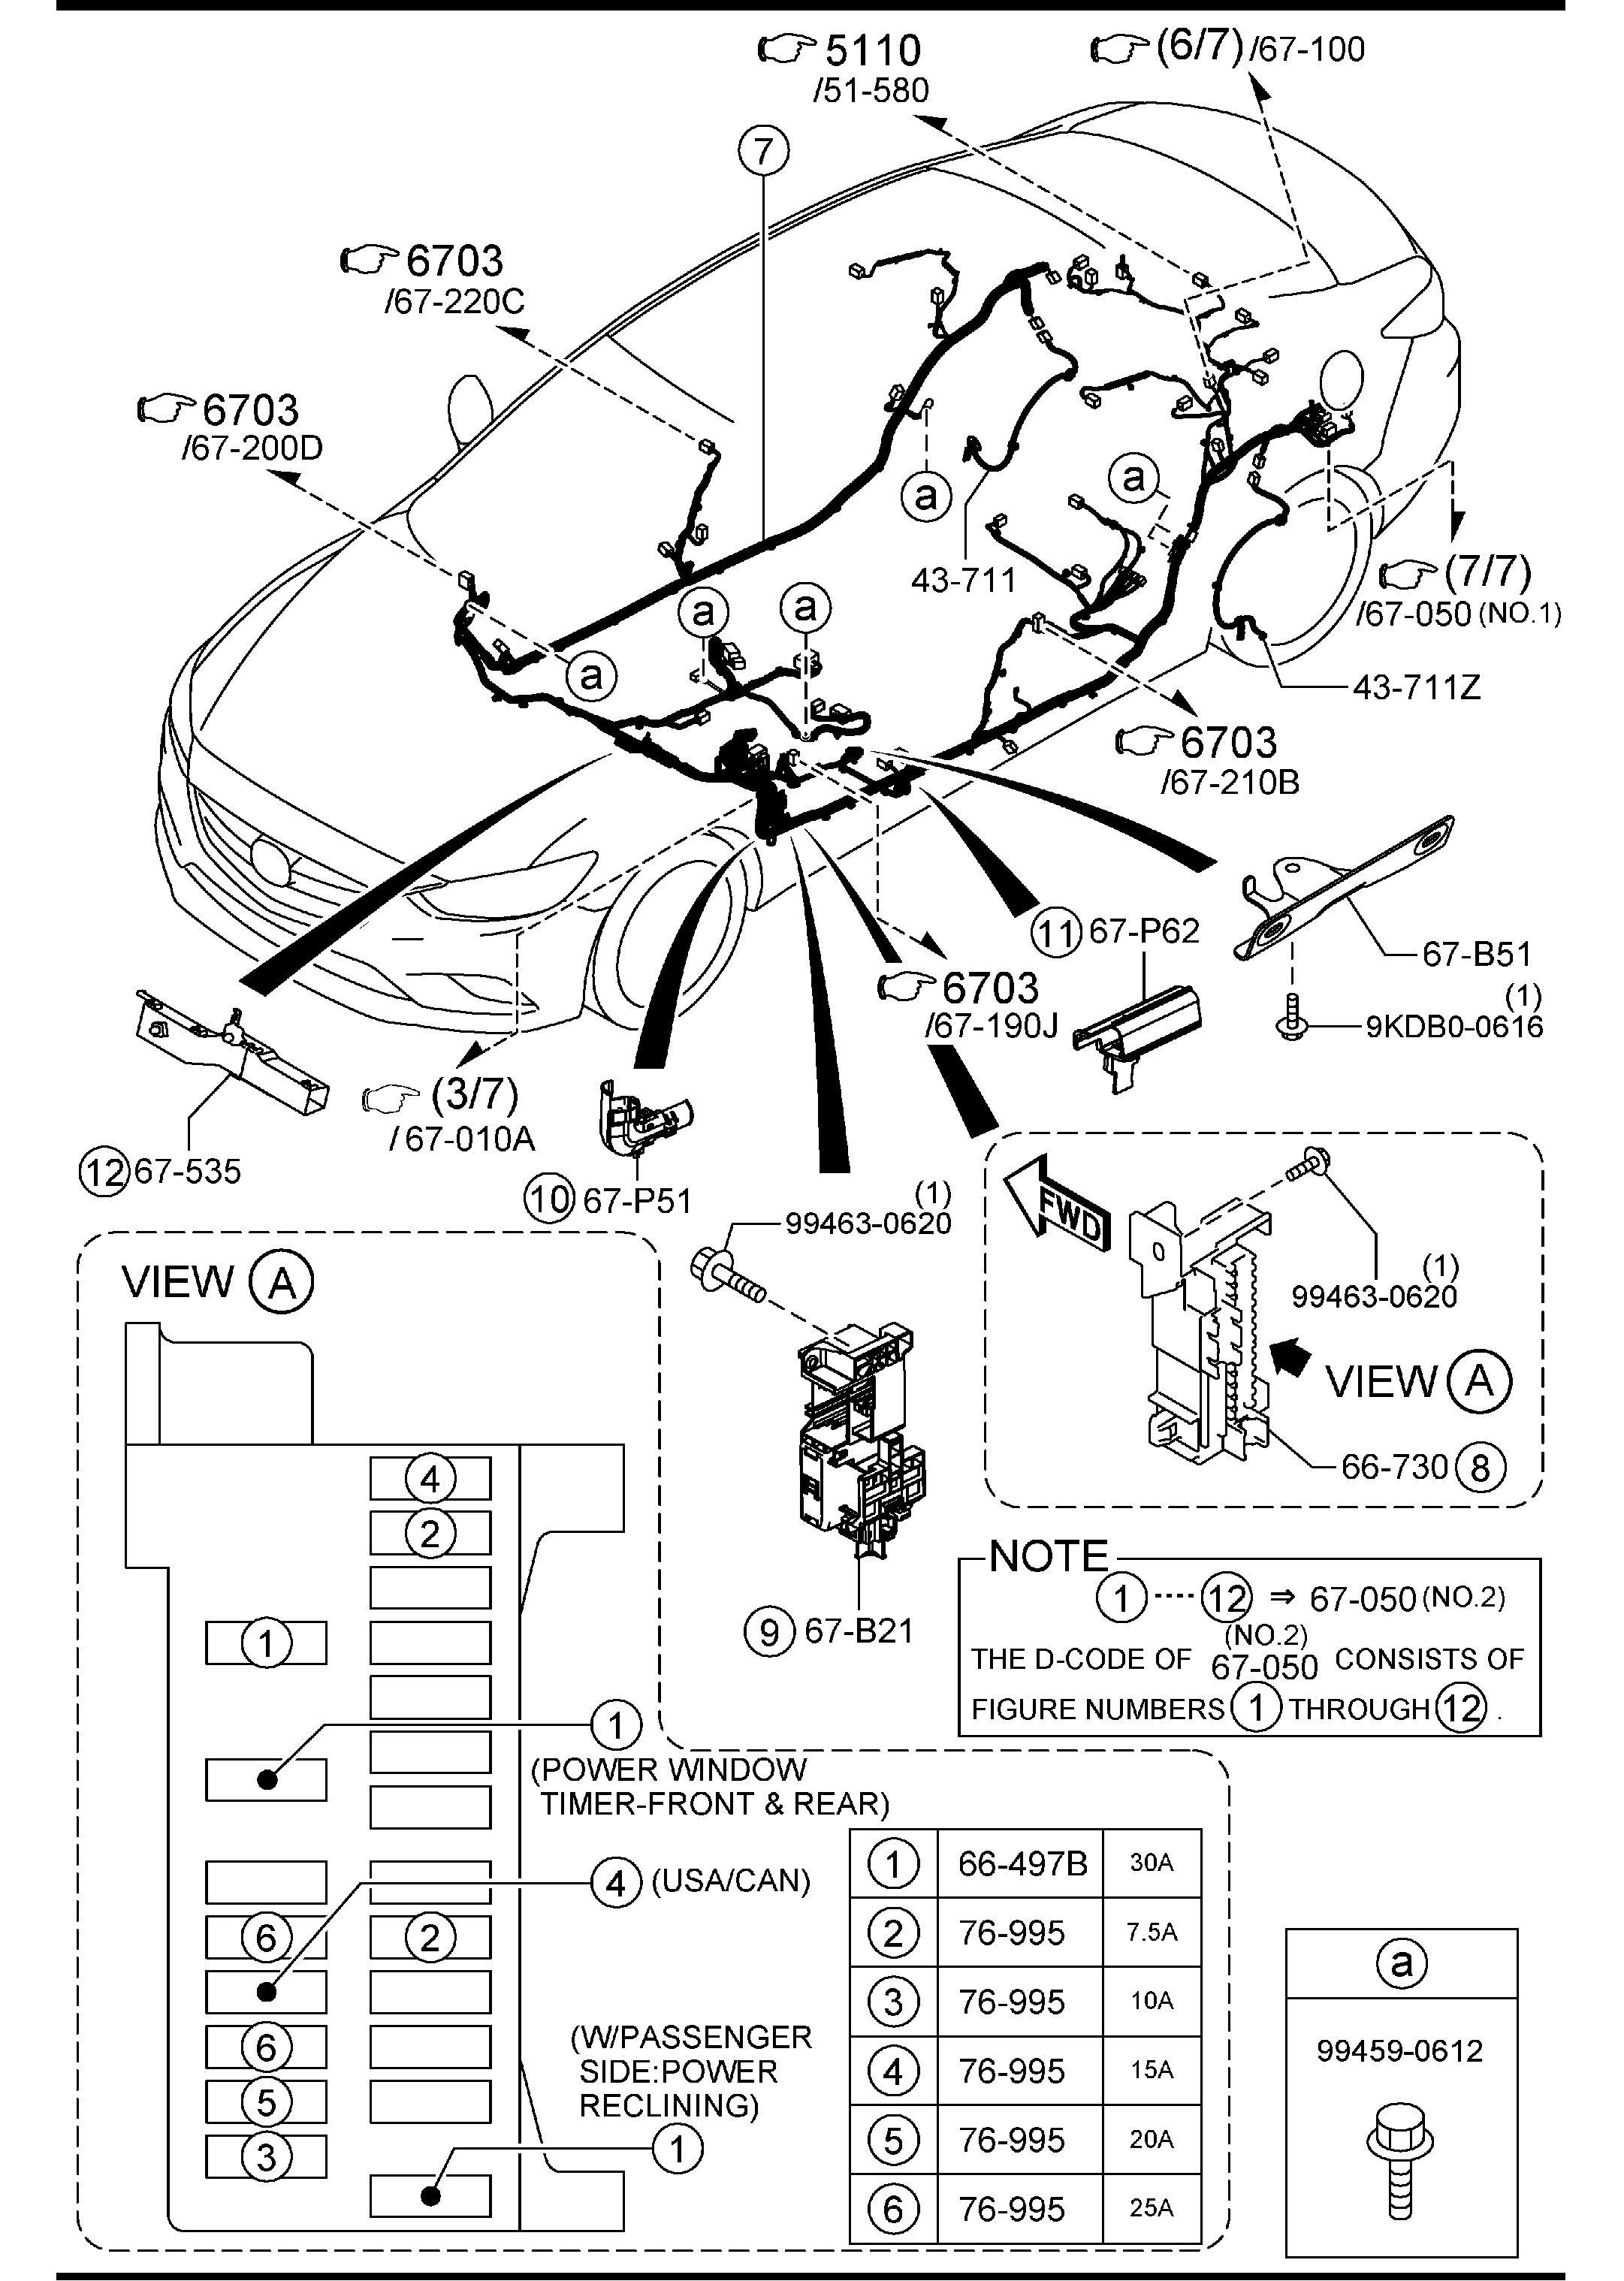 2007 Mazdasd 3 Engine Diagram Chevy Silverado Engine